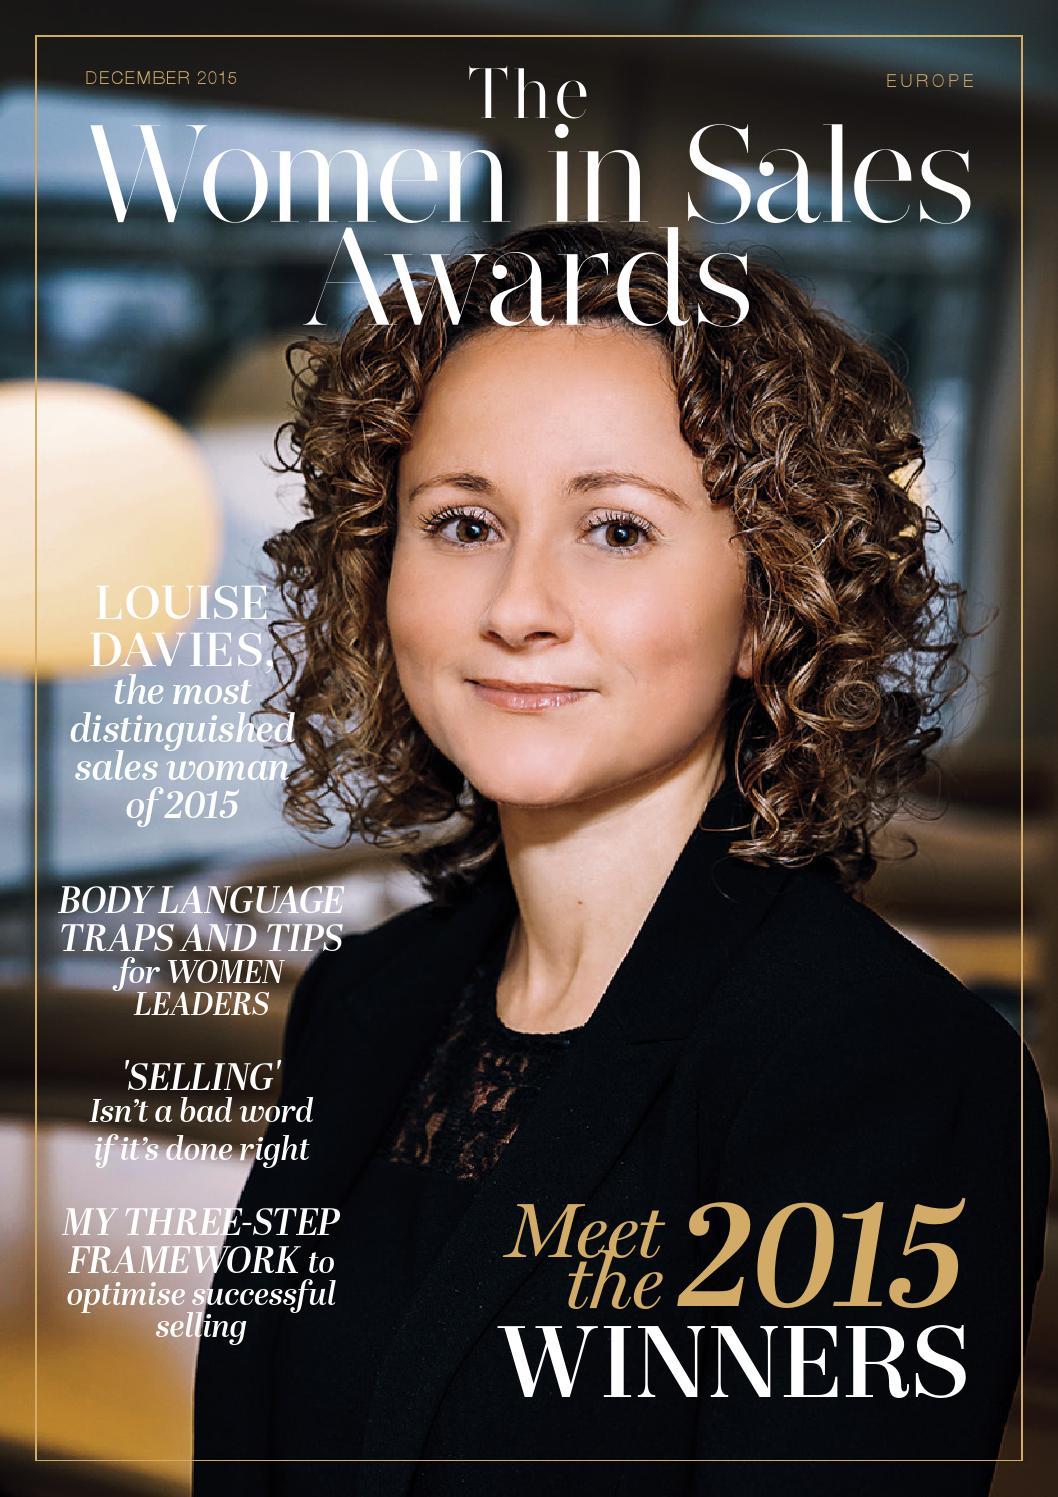 Women In Sales Awards 2015 Europe By Zars Media - Issuu-5120